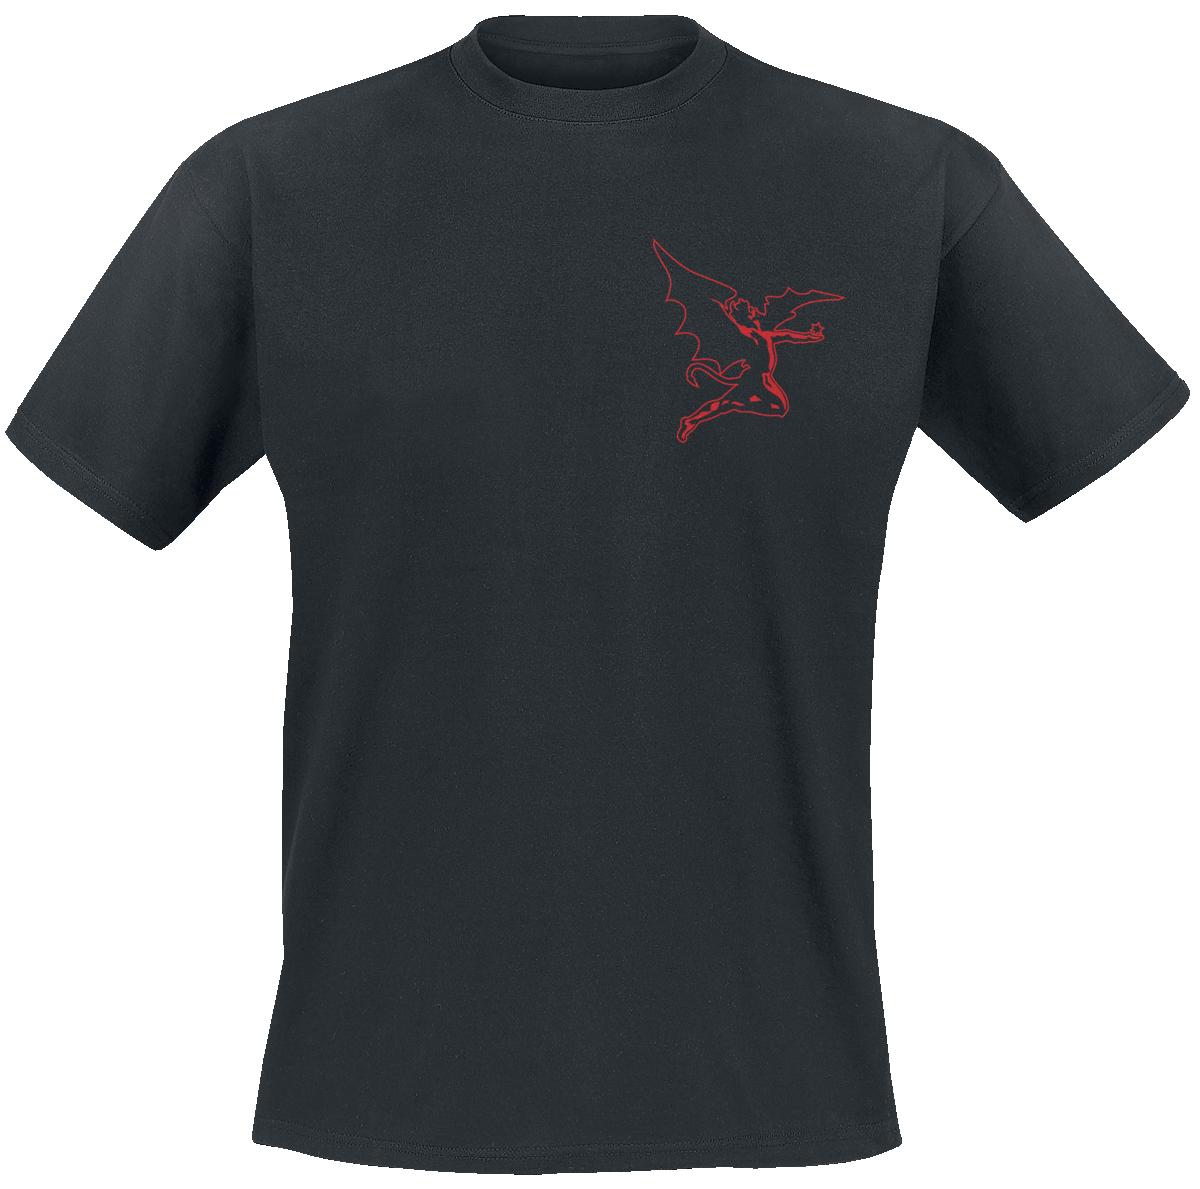 Black Sabbath - Cherub - T-Shirt - black image